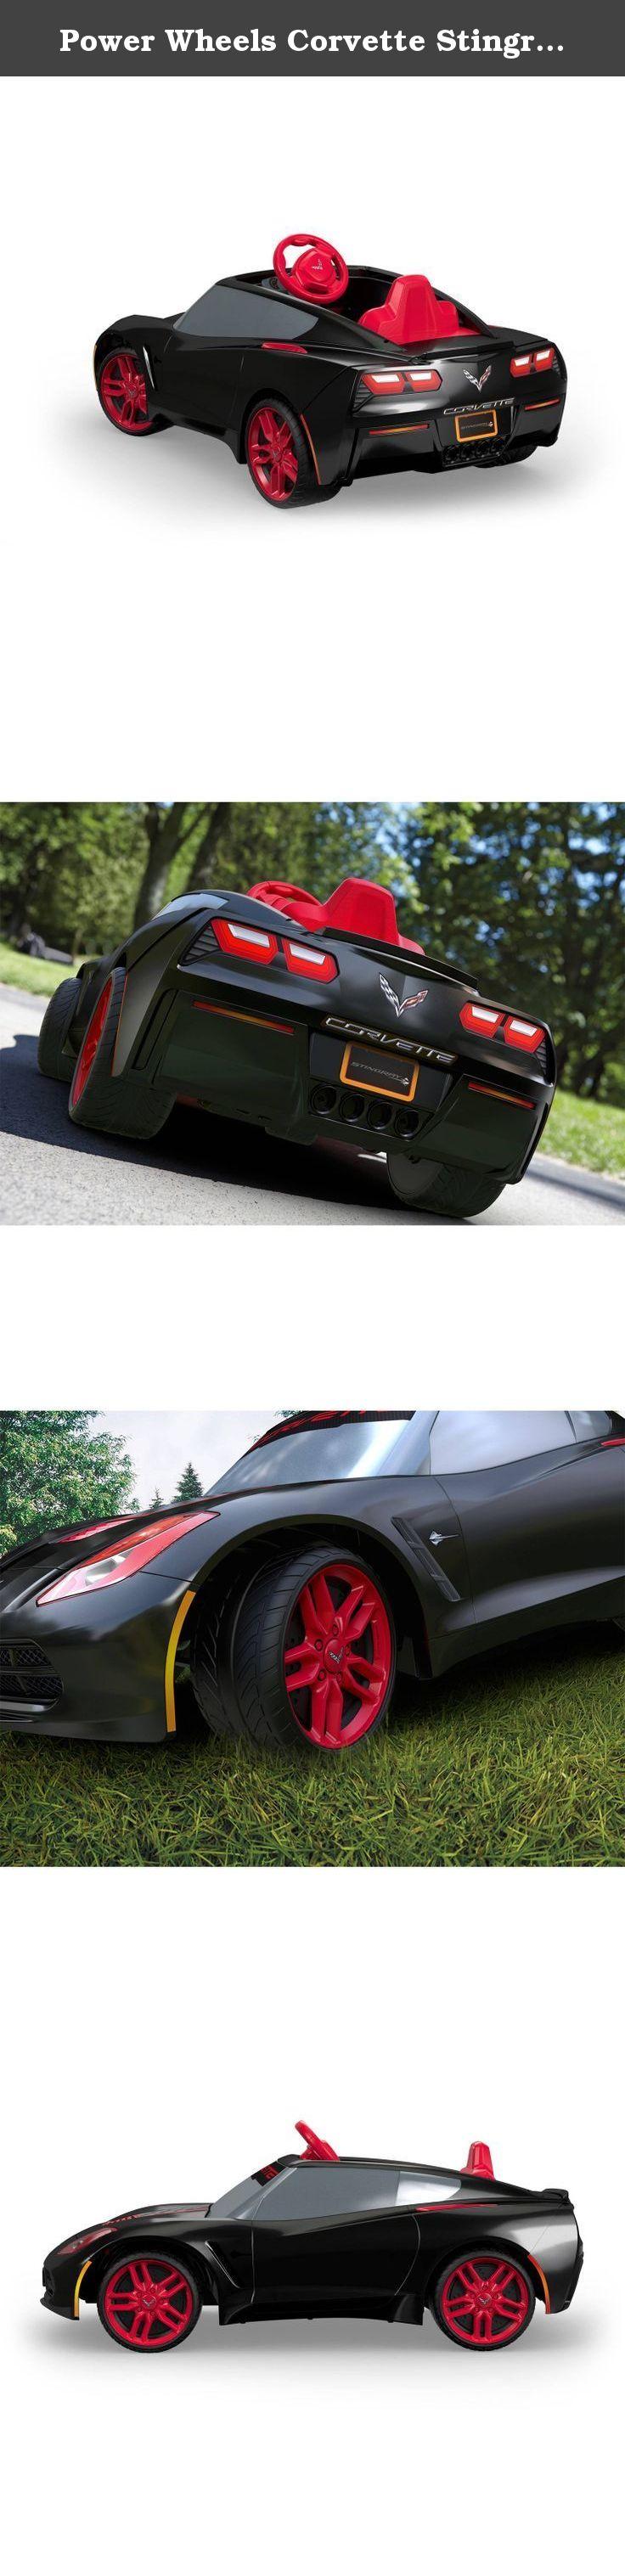 Power Wheels Corvette Stingray for kids rideon. This 6